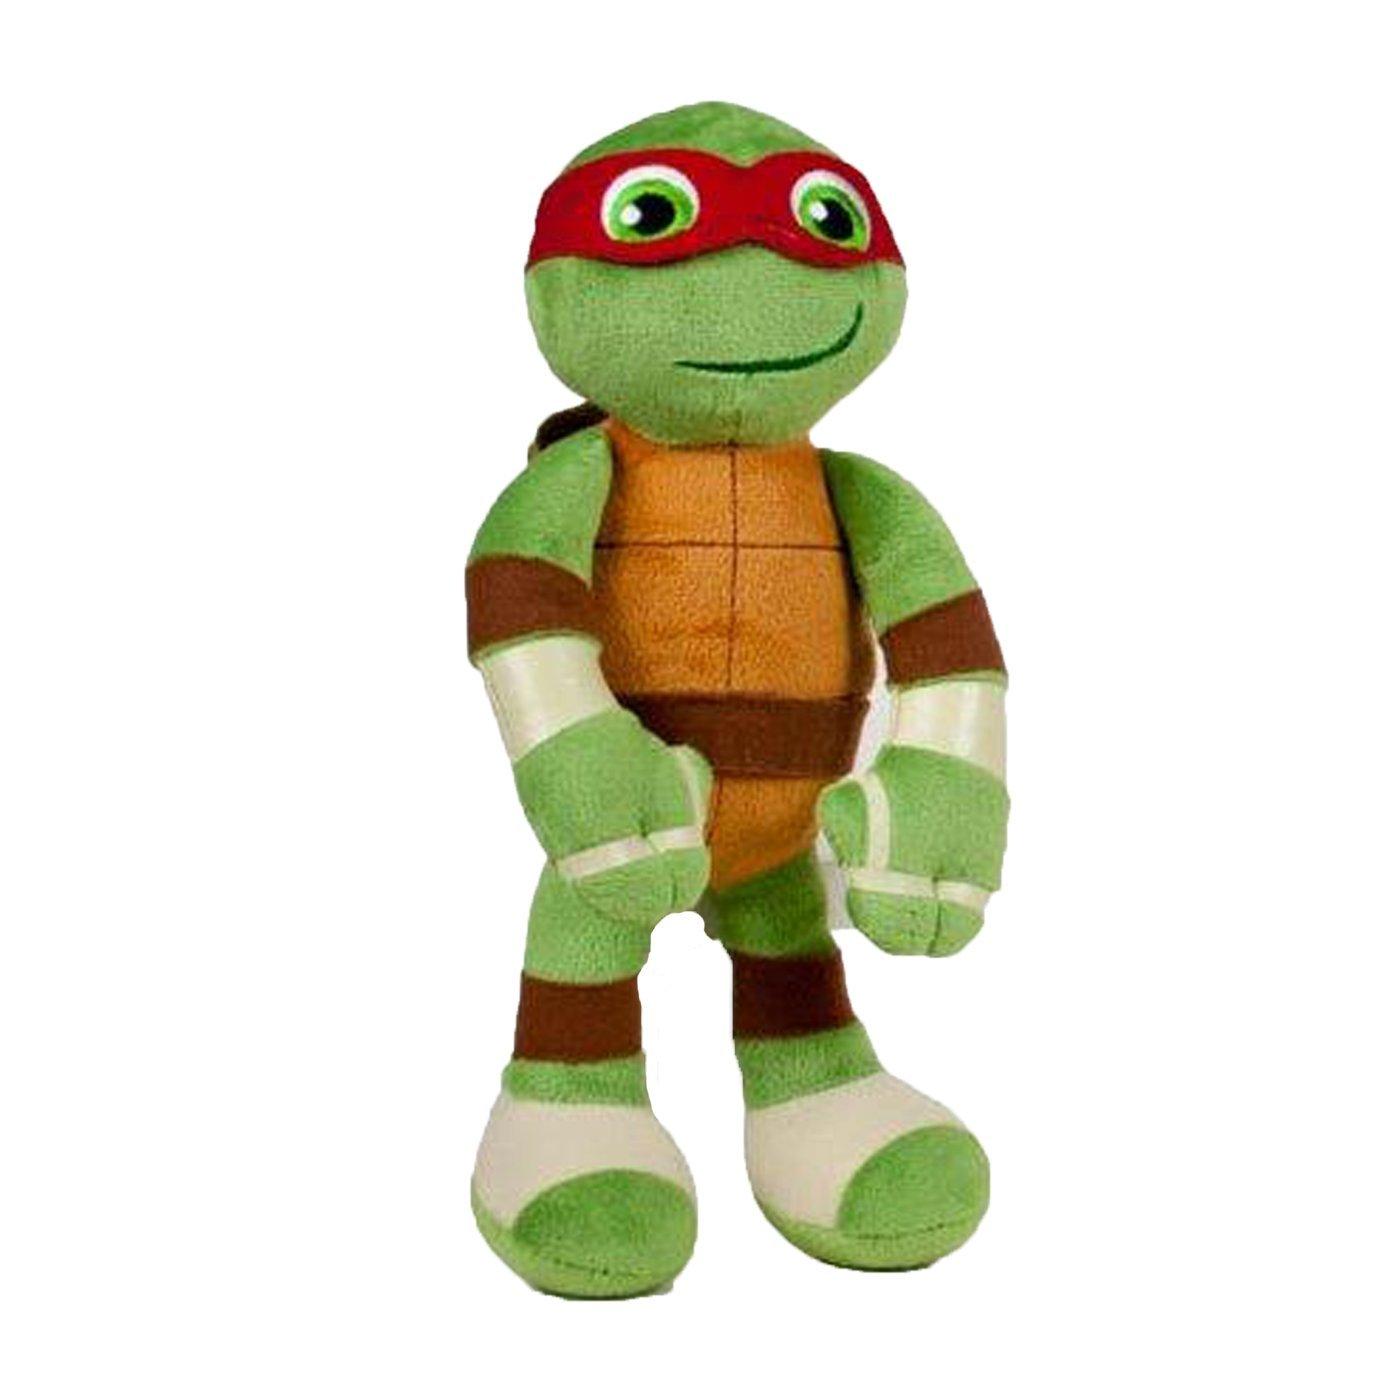 Ousdy - Peluche de Tortugas Ninja 31cm Super Soft 760014036 ...